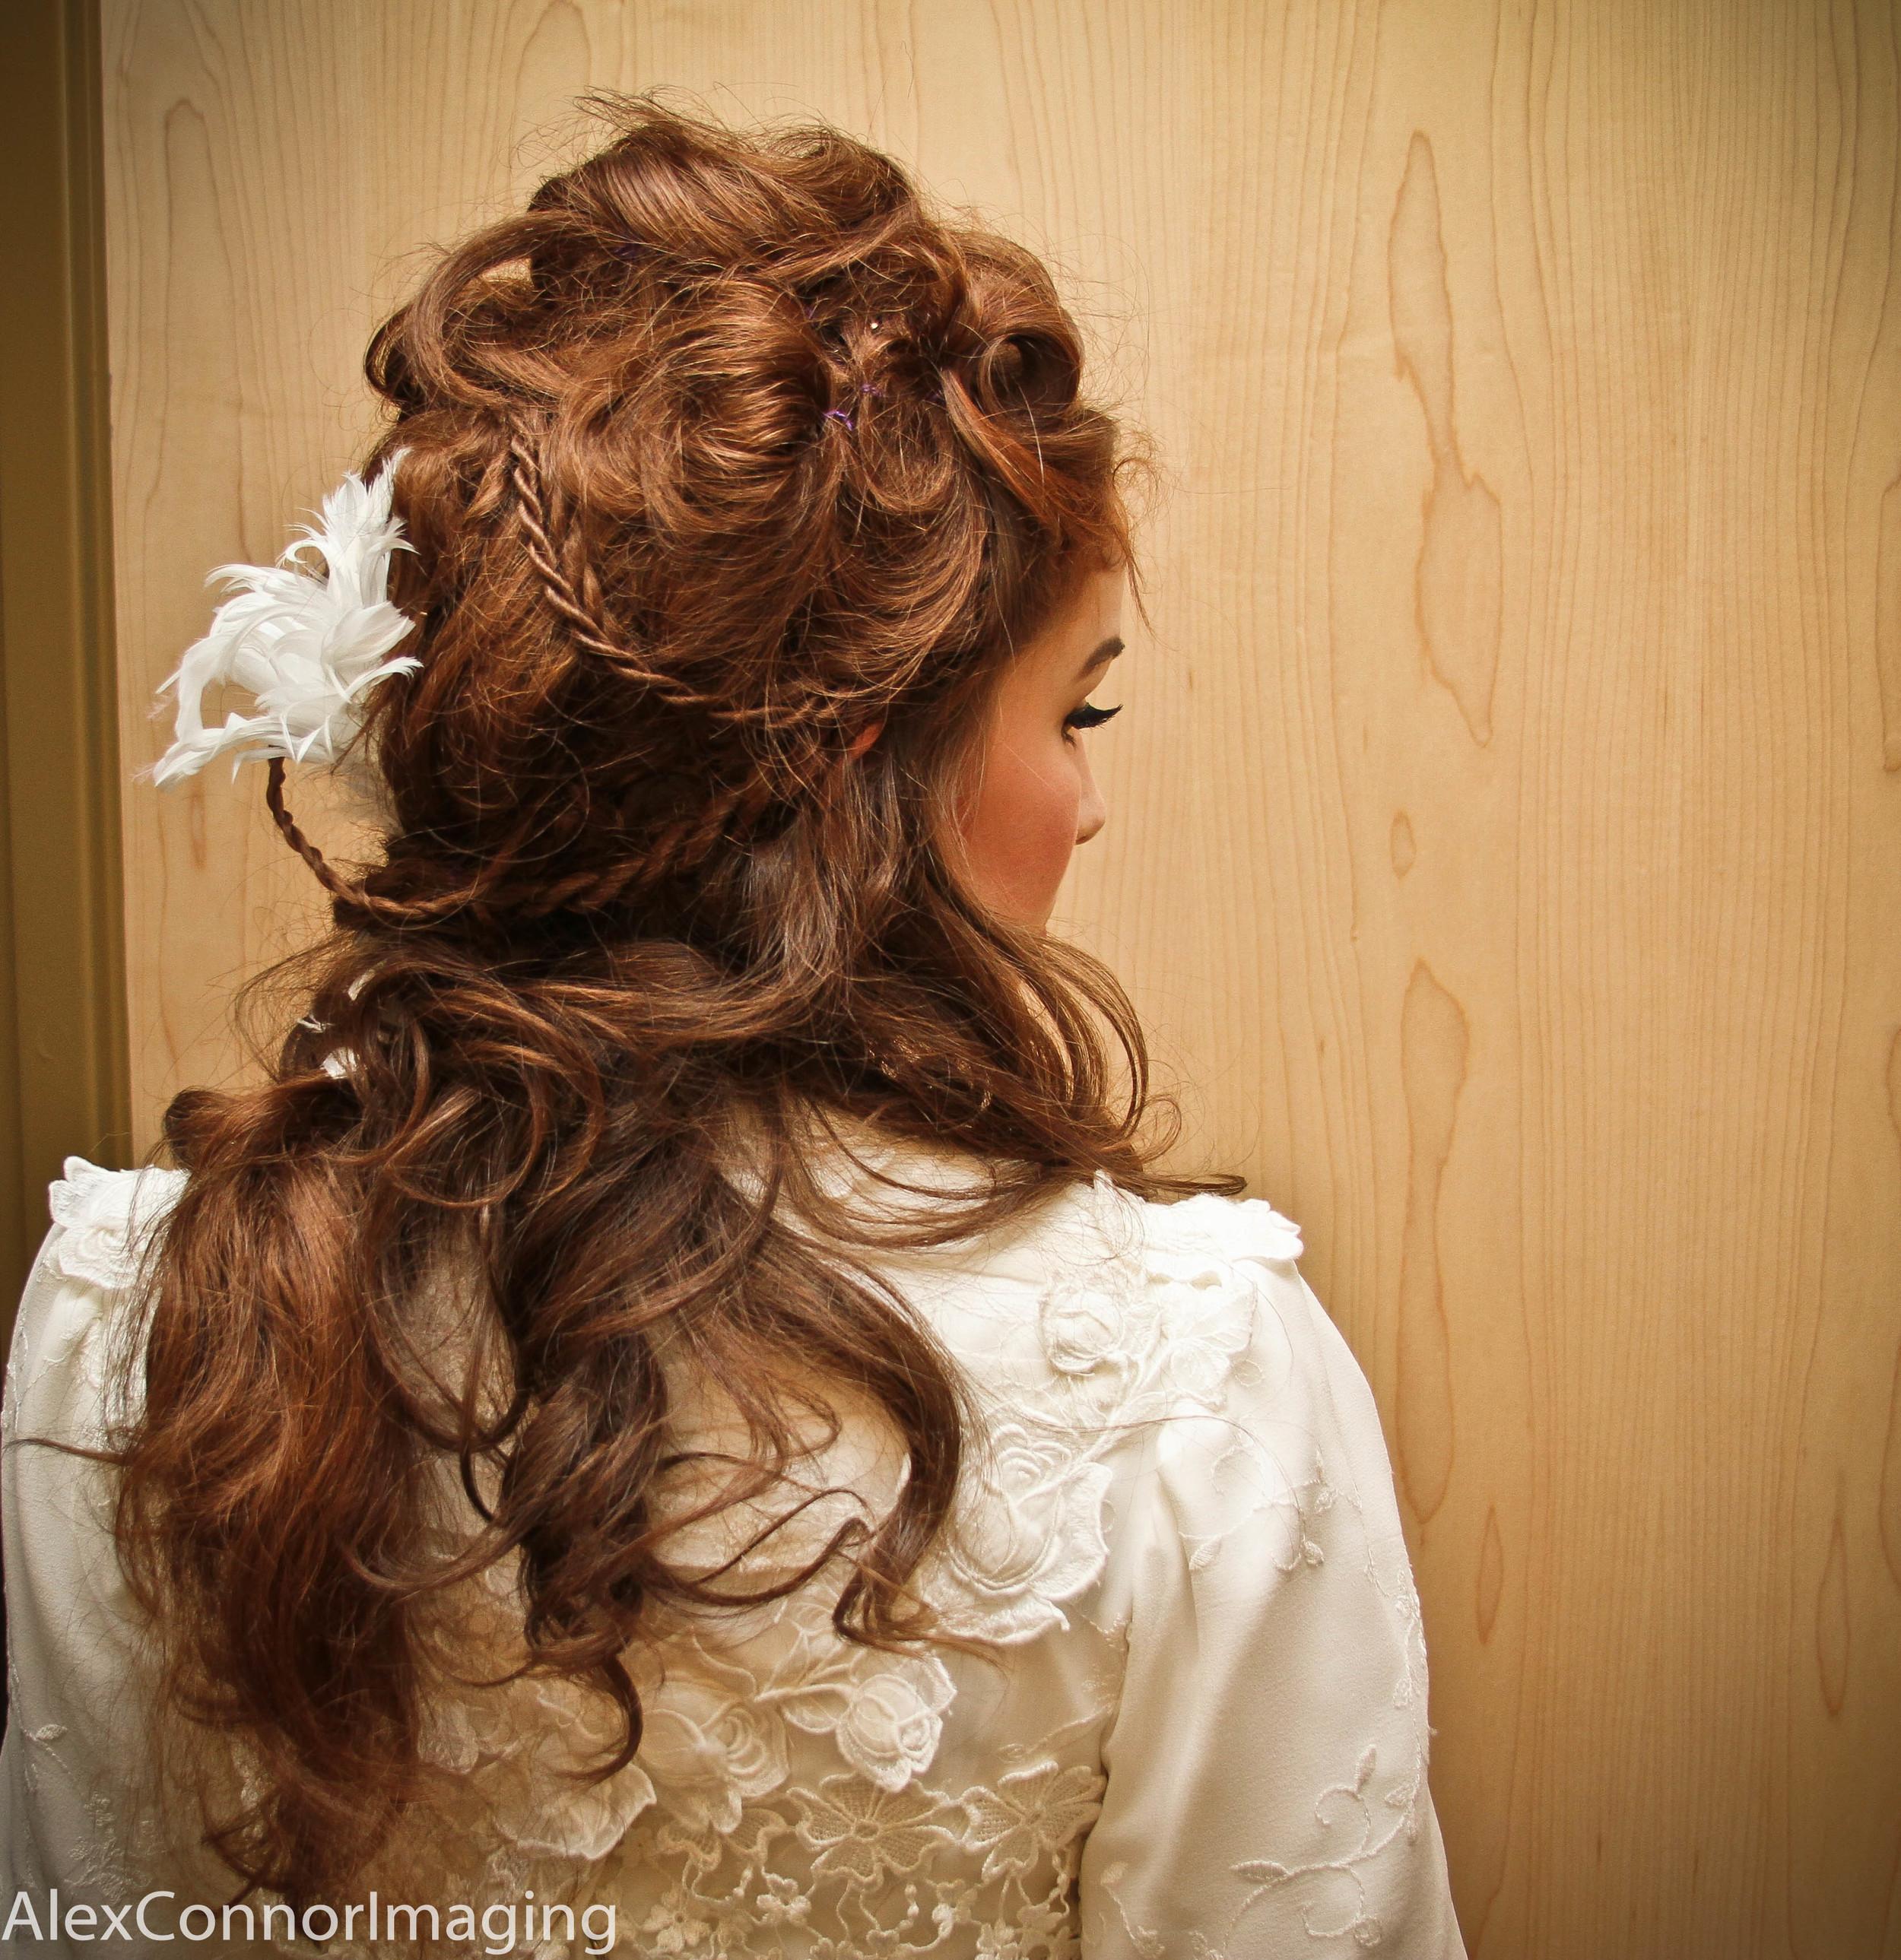 Raina- completed wig